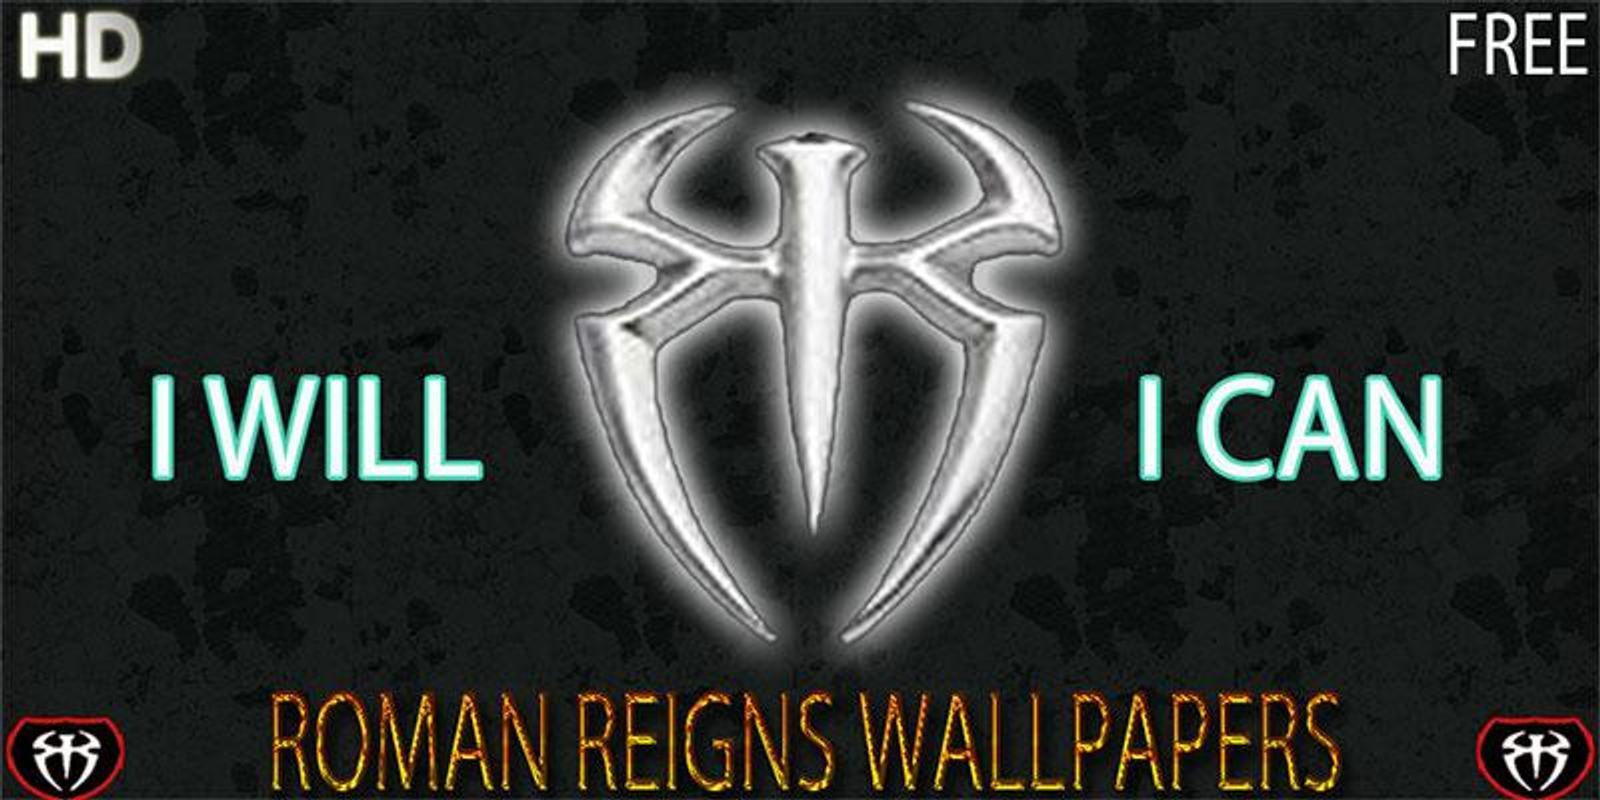 Roman Reigns HD Wallpapers WWE Screenshot 3